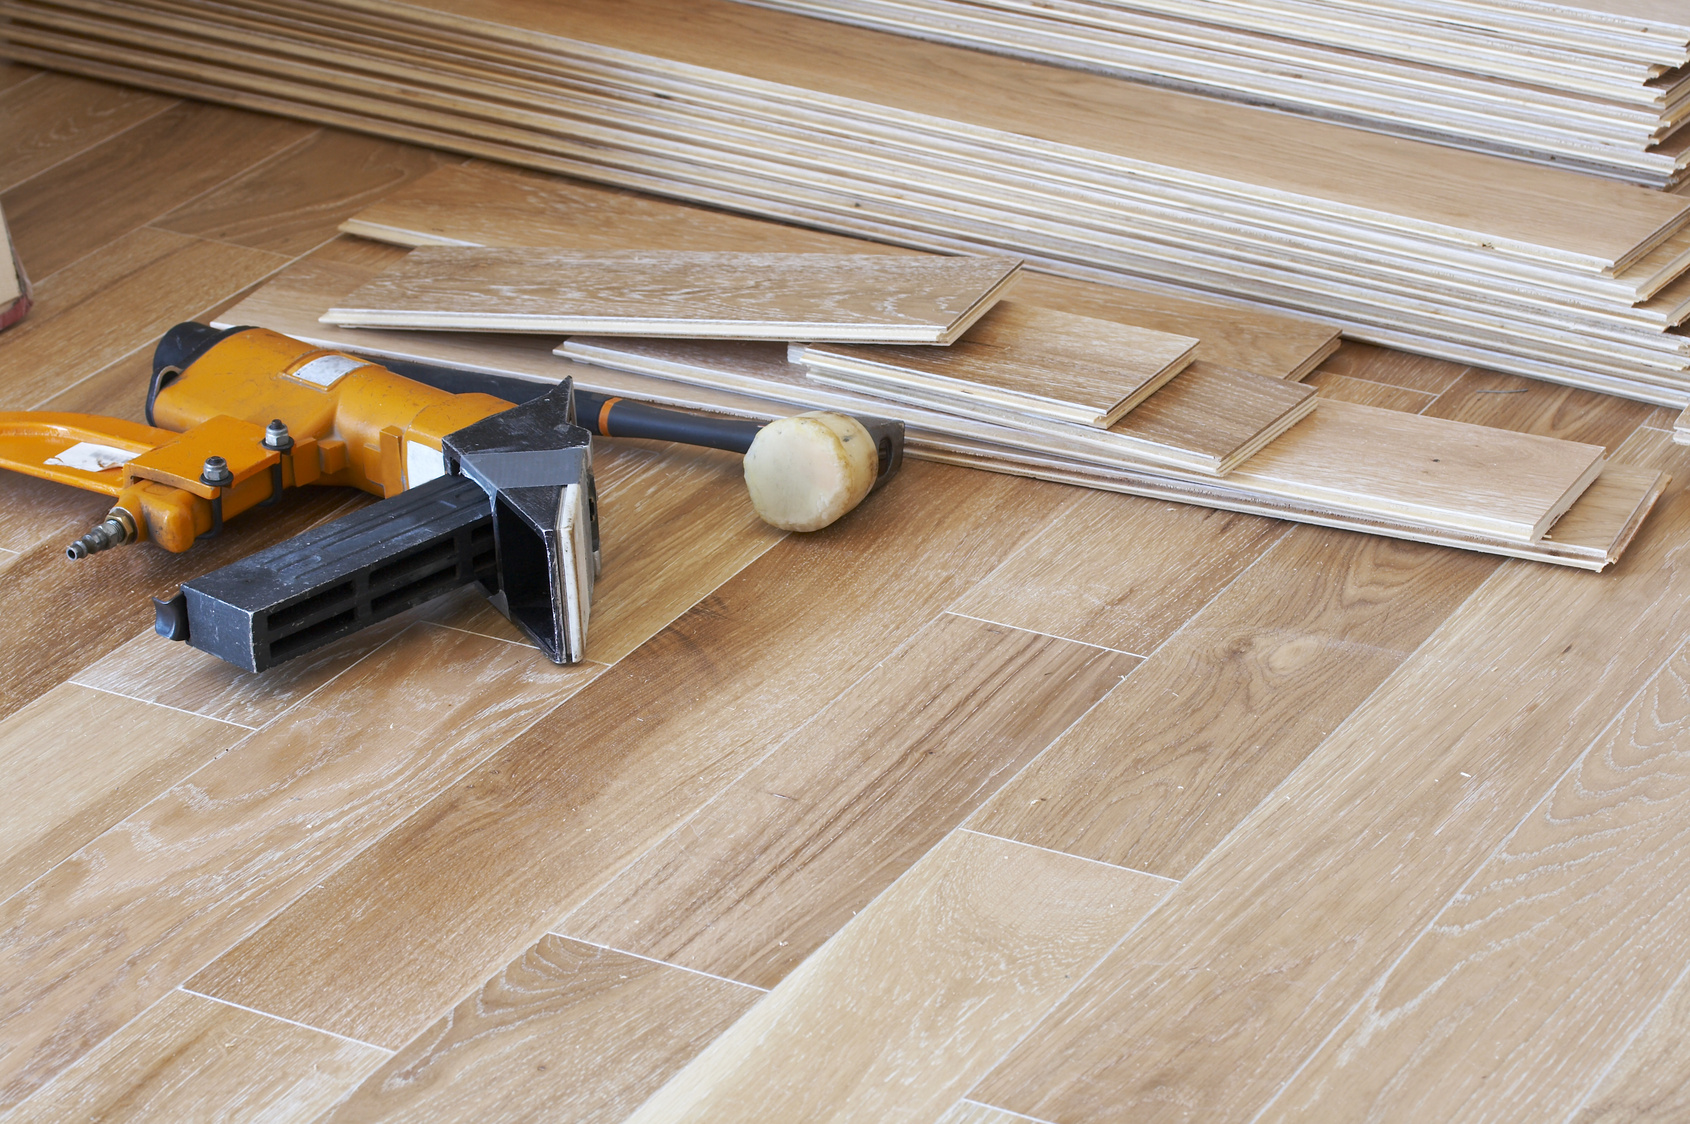 The Finishing Touch Floors, Inc. - 2956 Randolph Ave, Costa Mesa, CA 92626